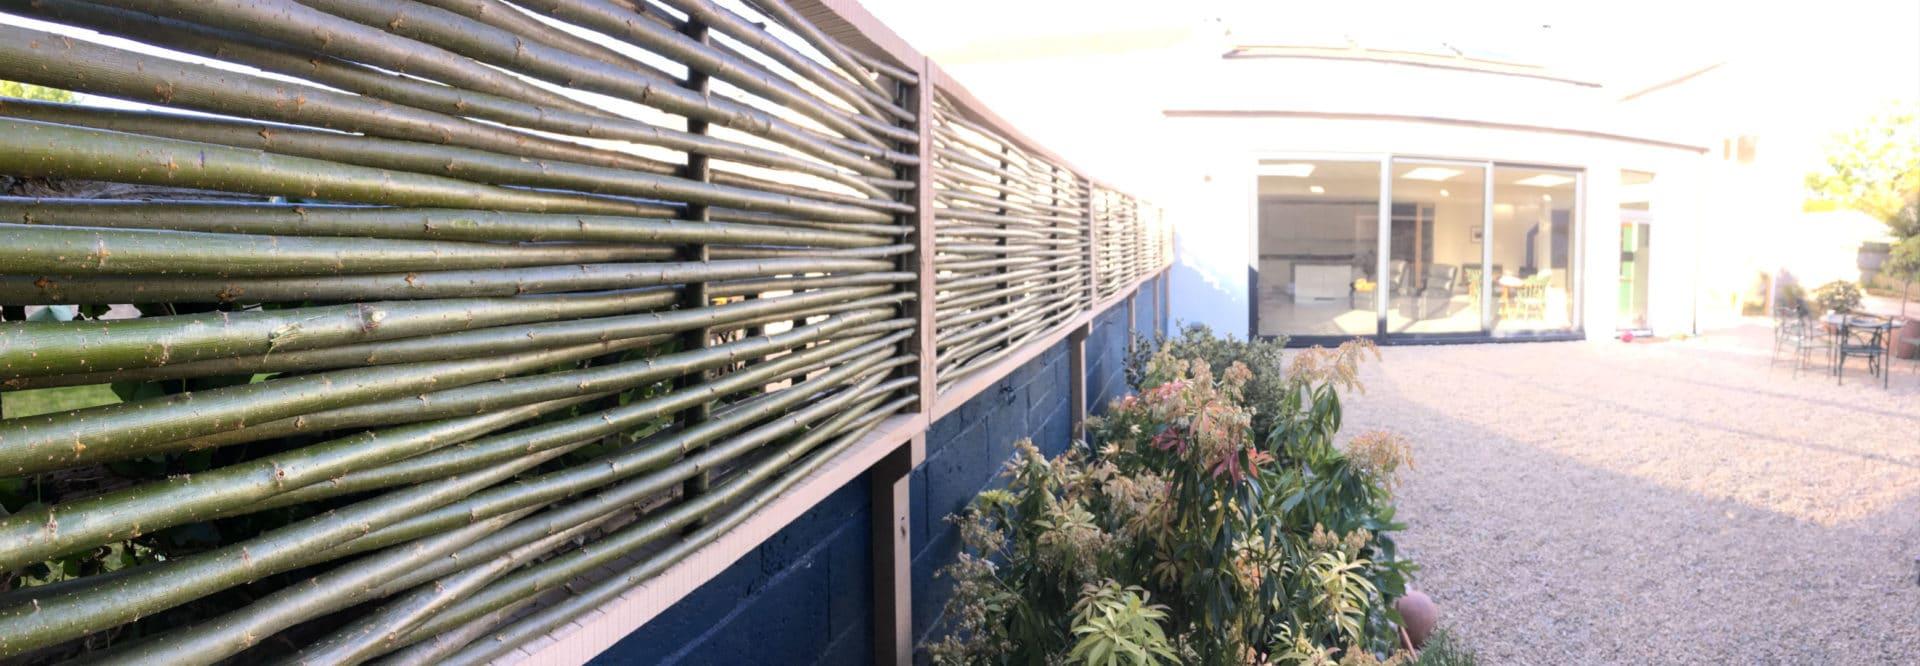 Willow privacy screen back garden